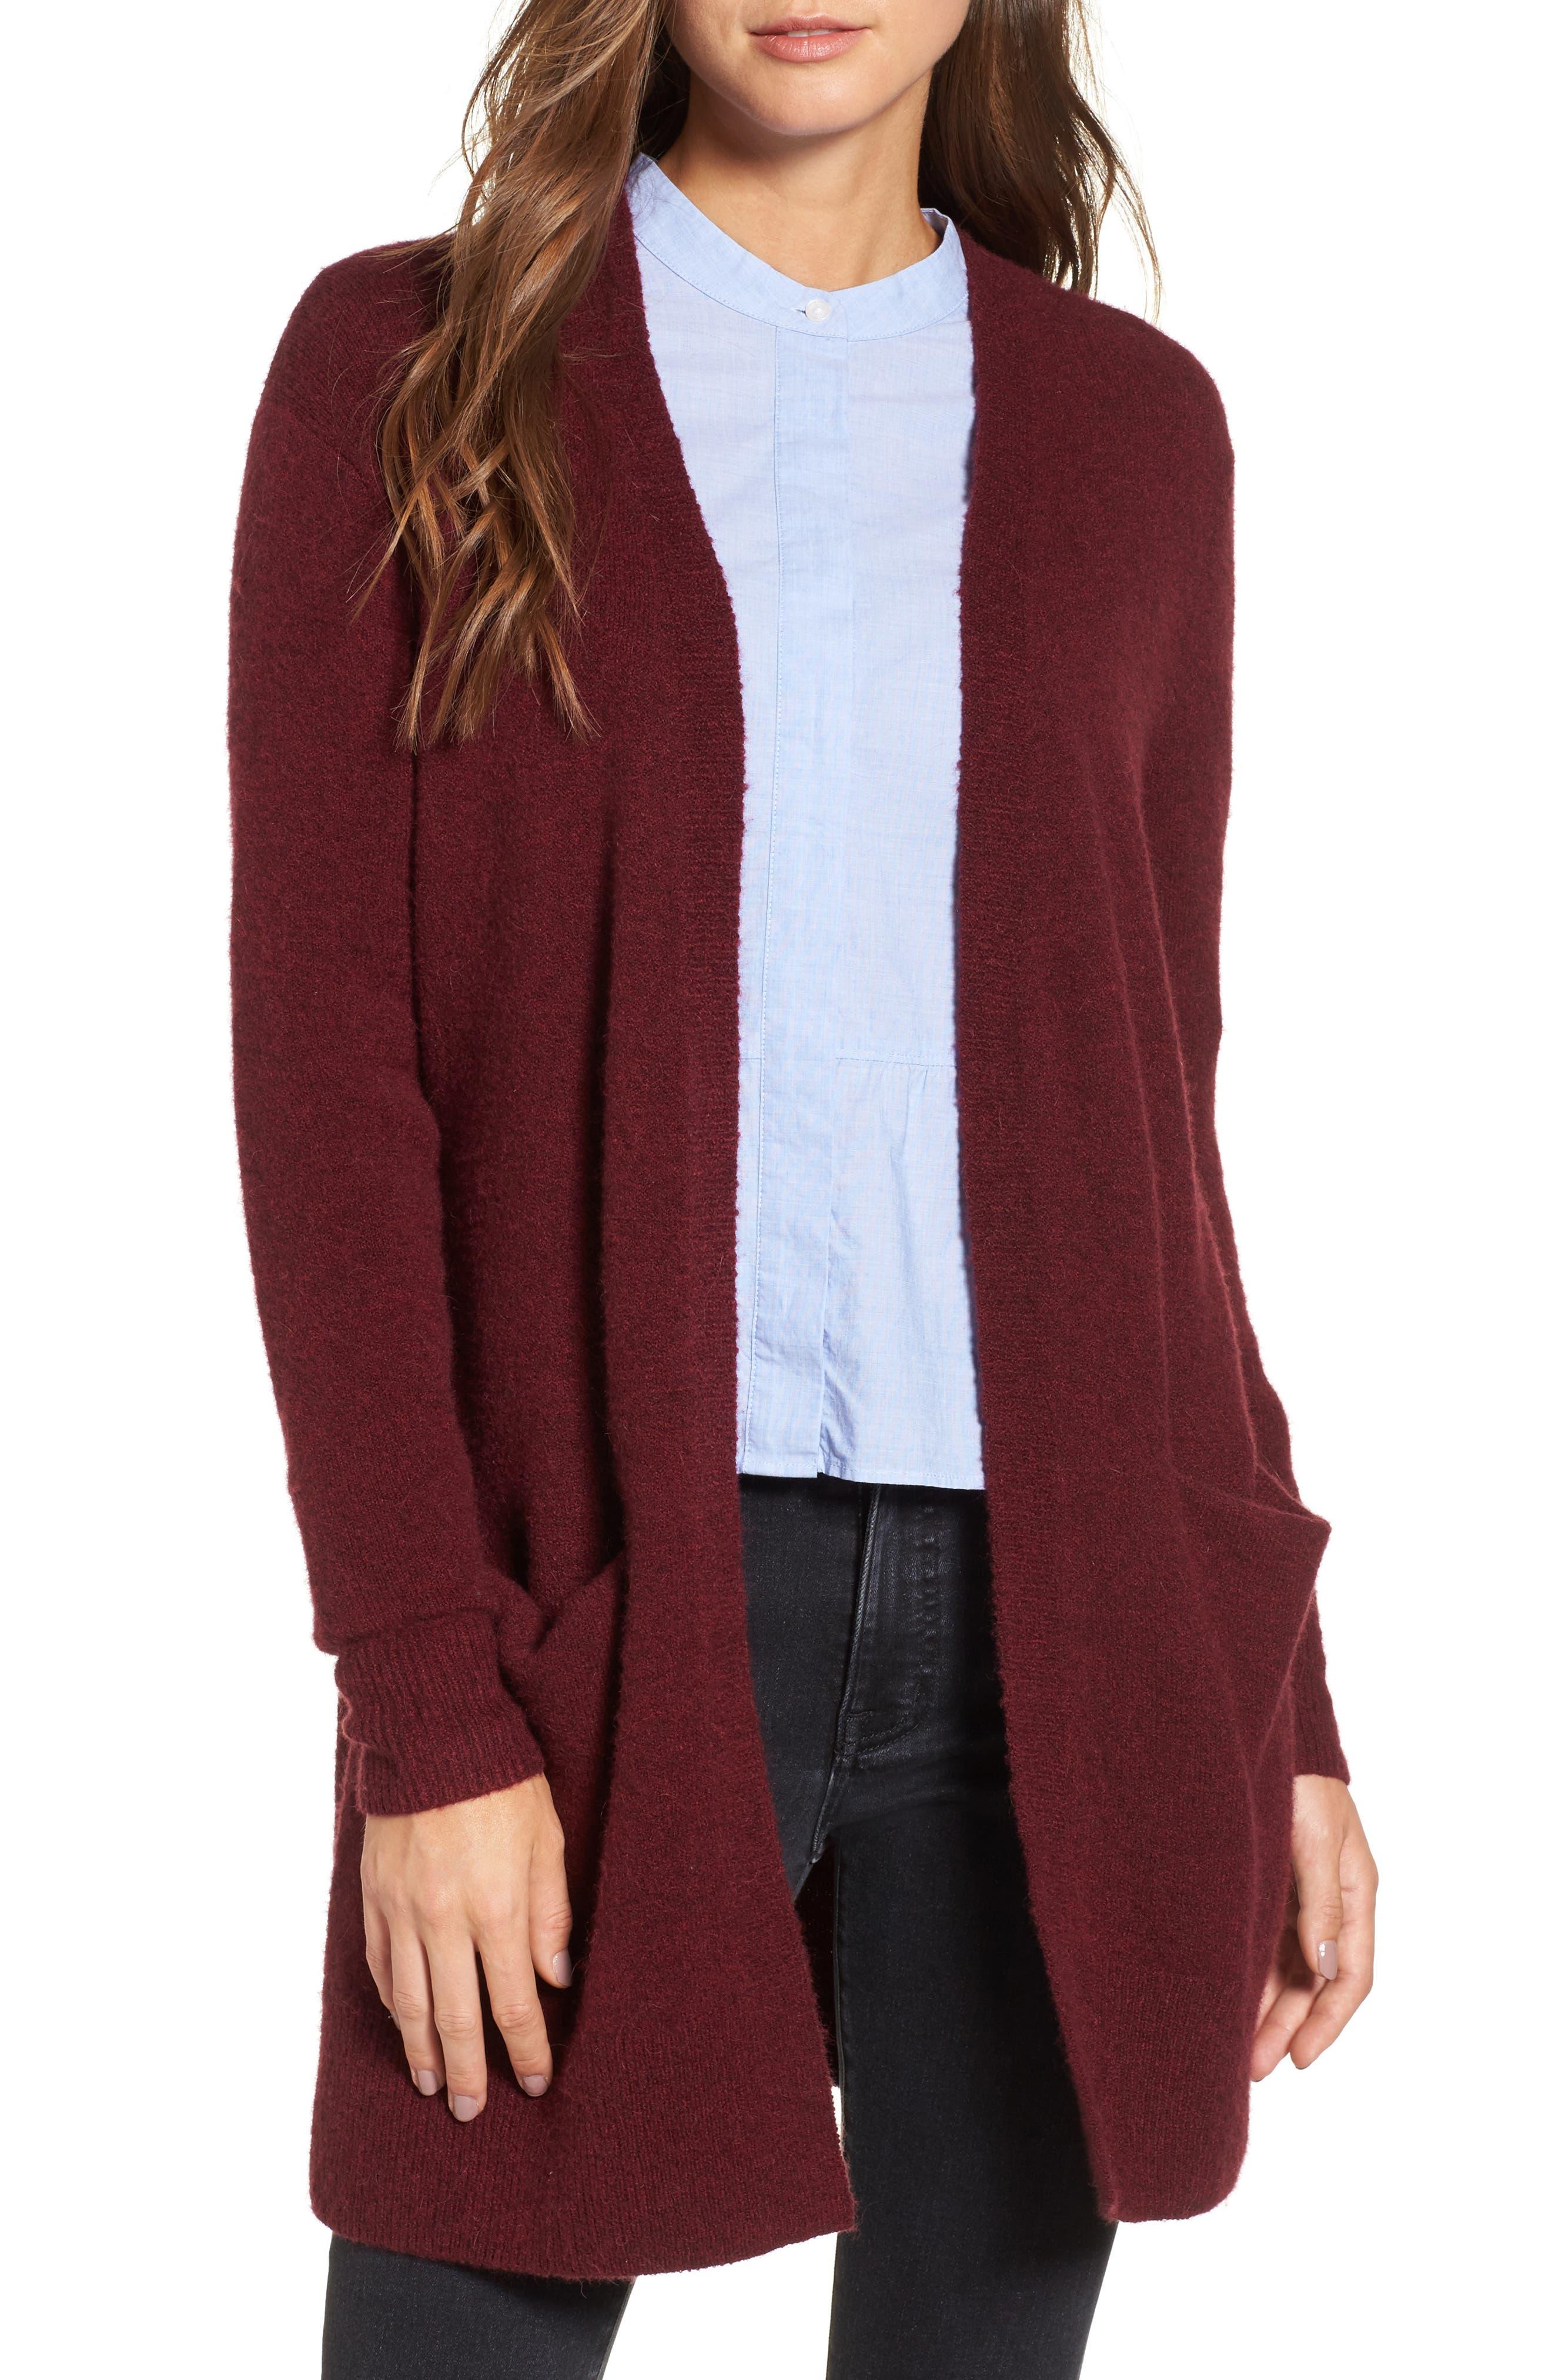 Women's Long Sleeve Cardigan Sweaters | Nordstrom